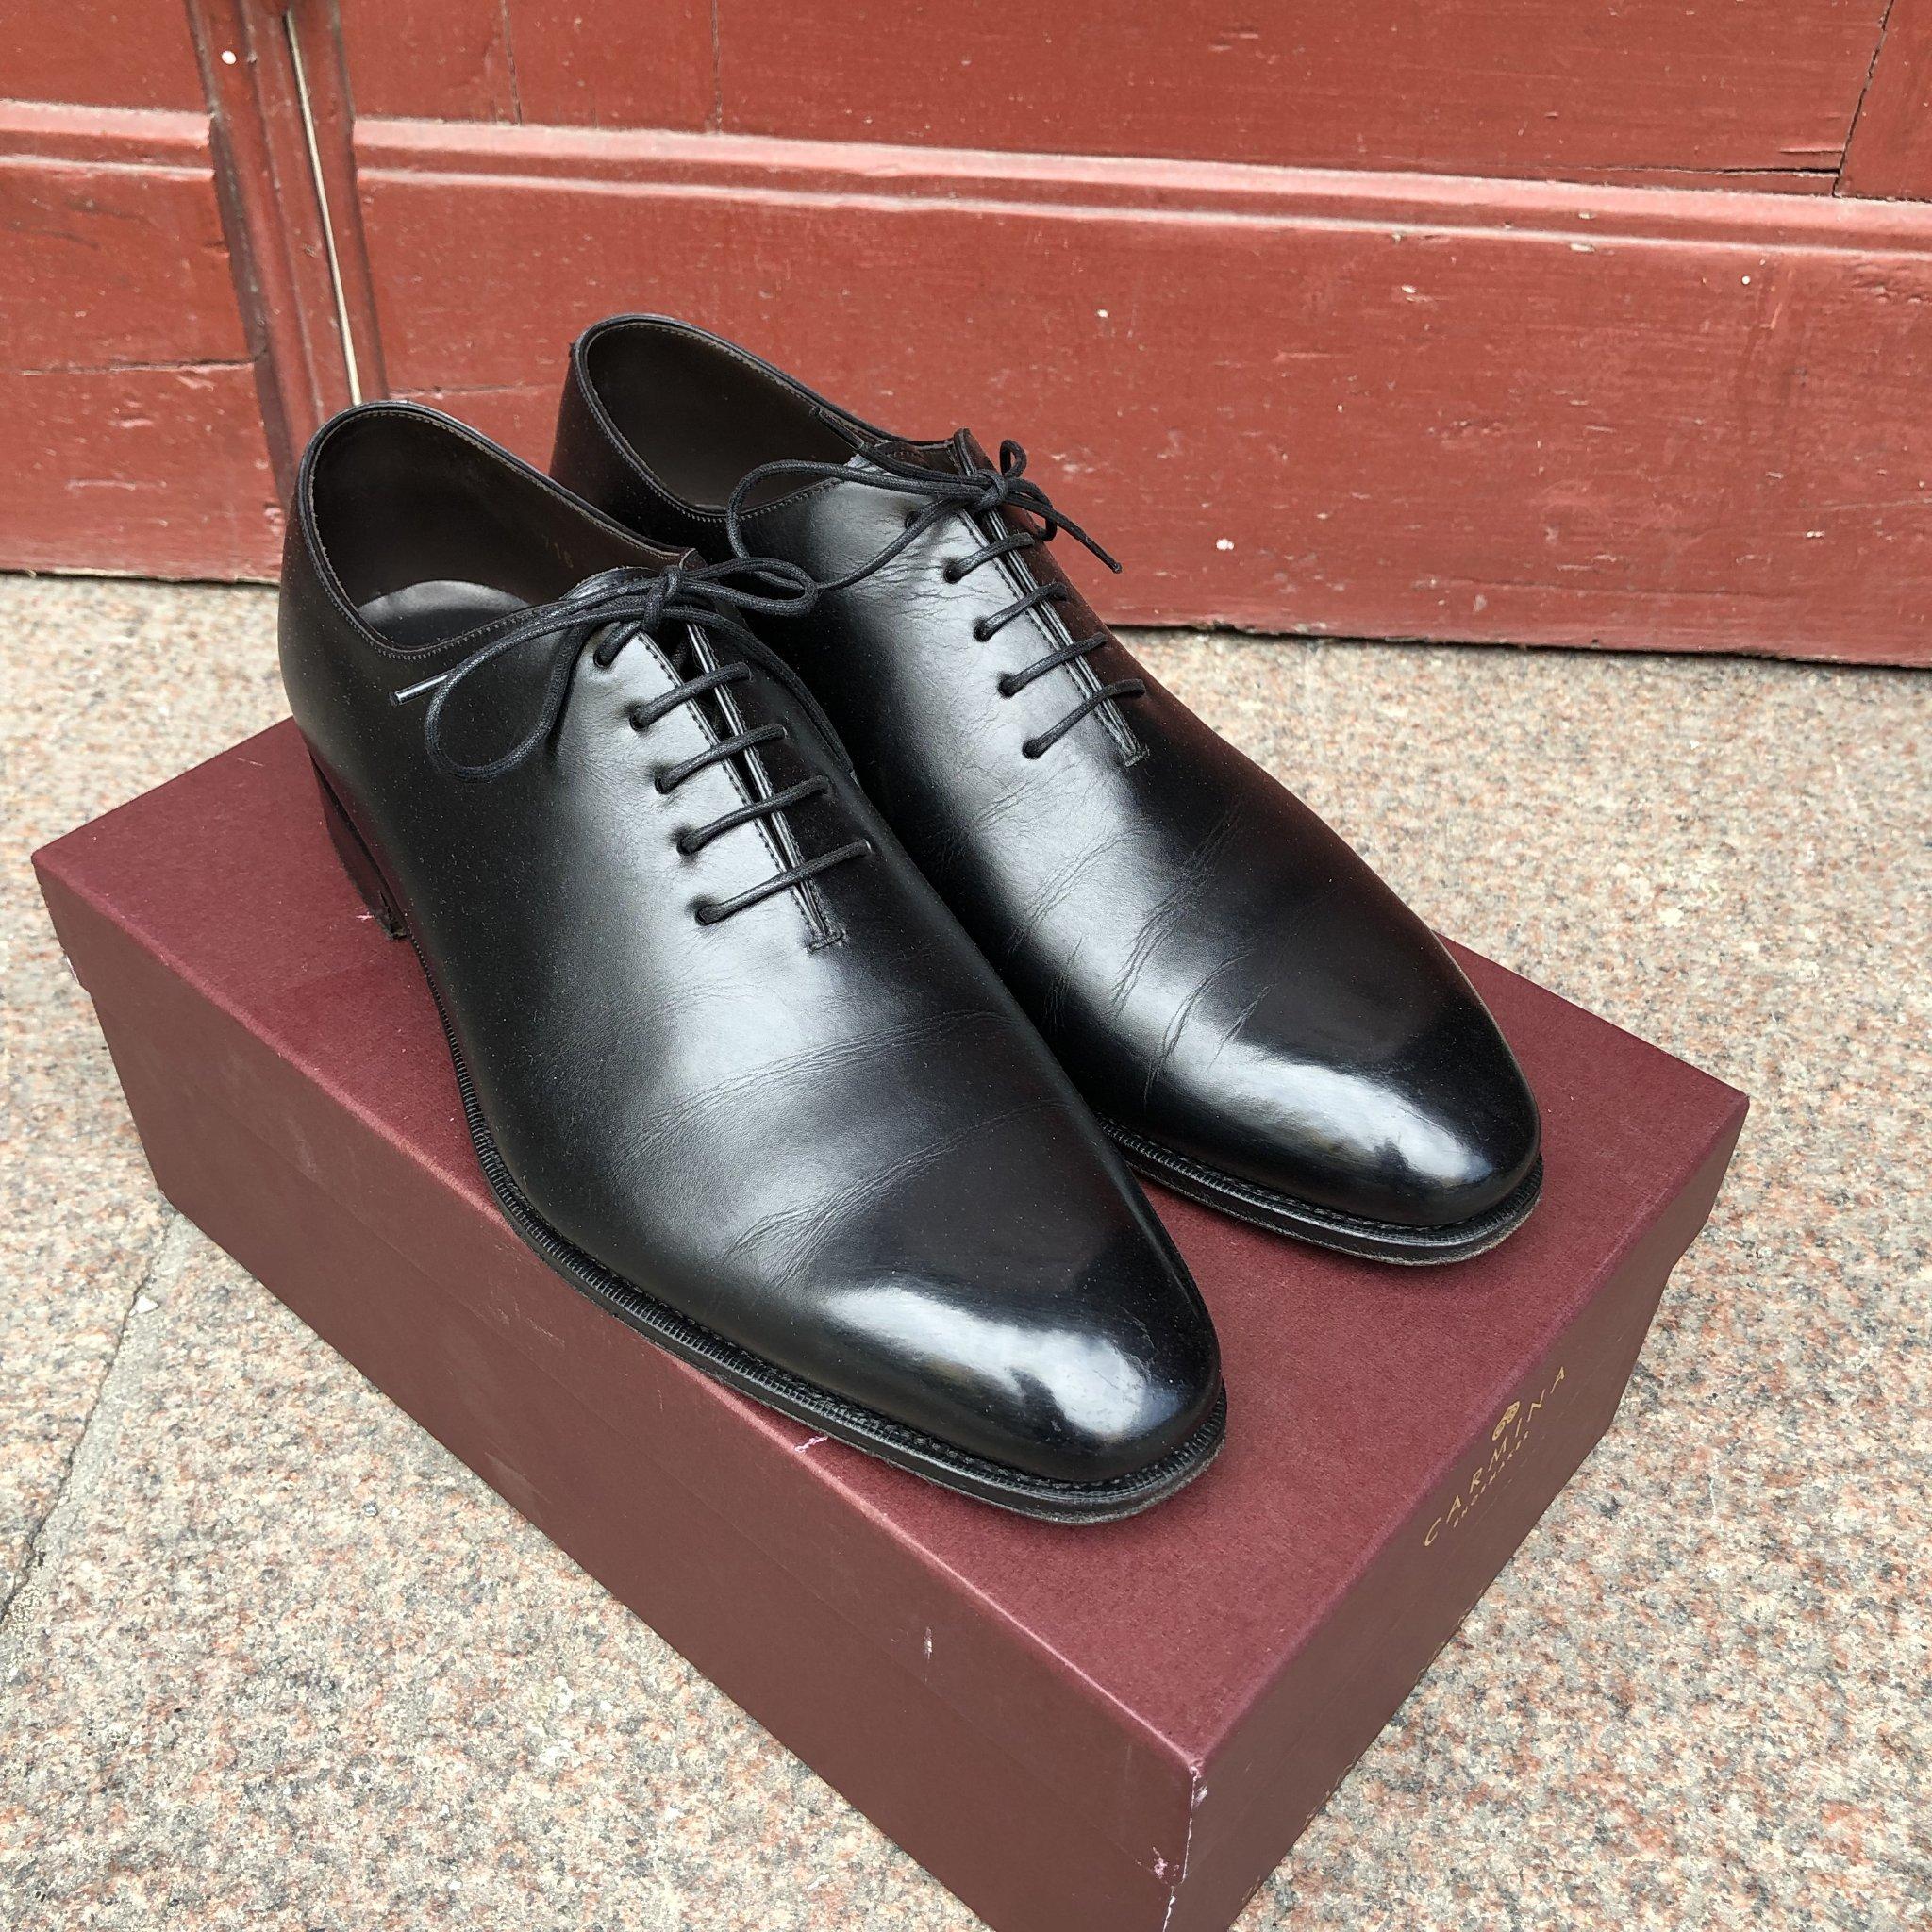 1ab47c8db13 Carmina Wholecut Oxford Black Calf storlek 9,5 (353169559) ᐈ Köp på ...